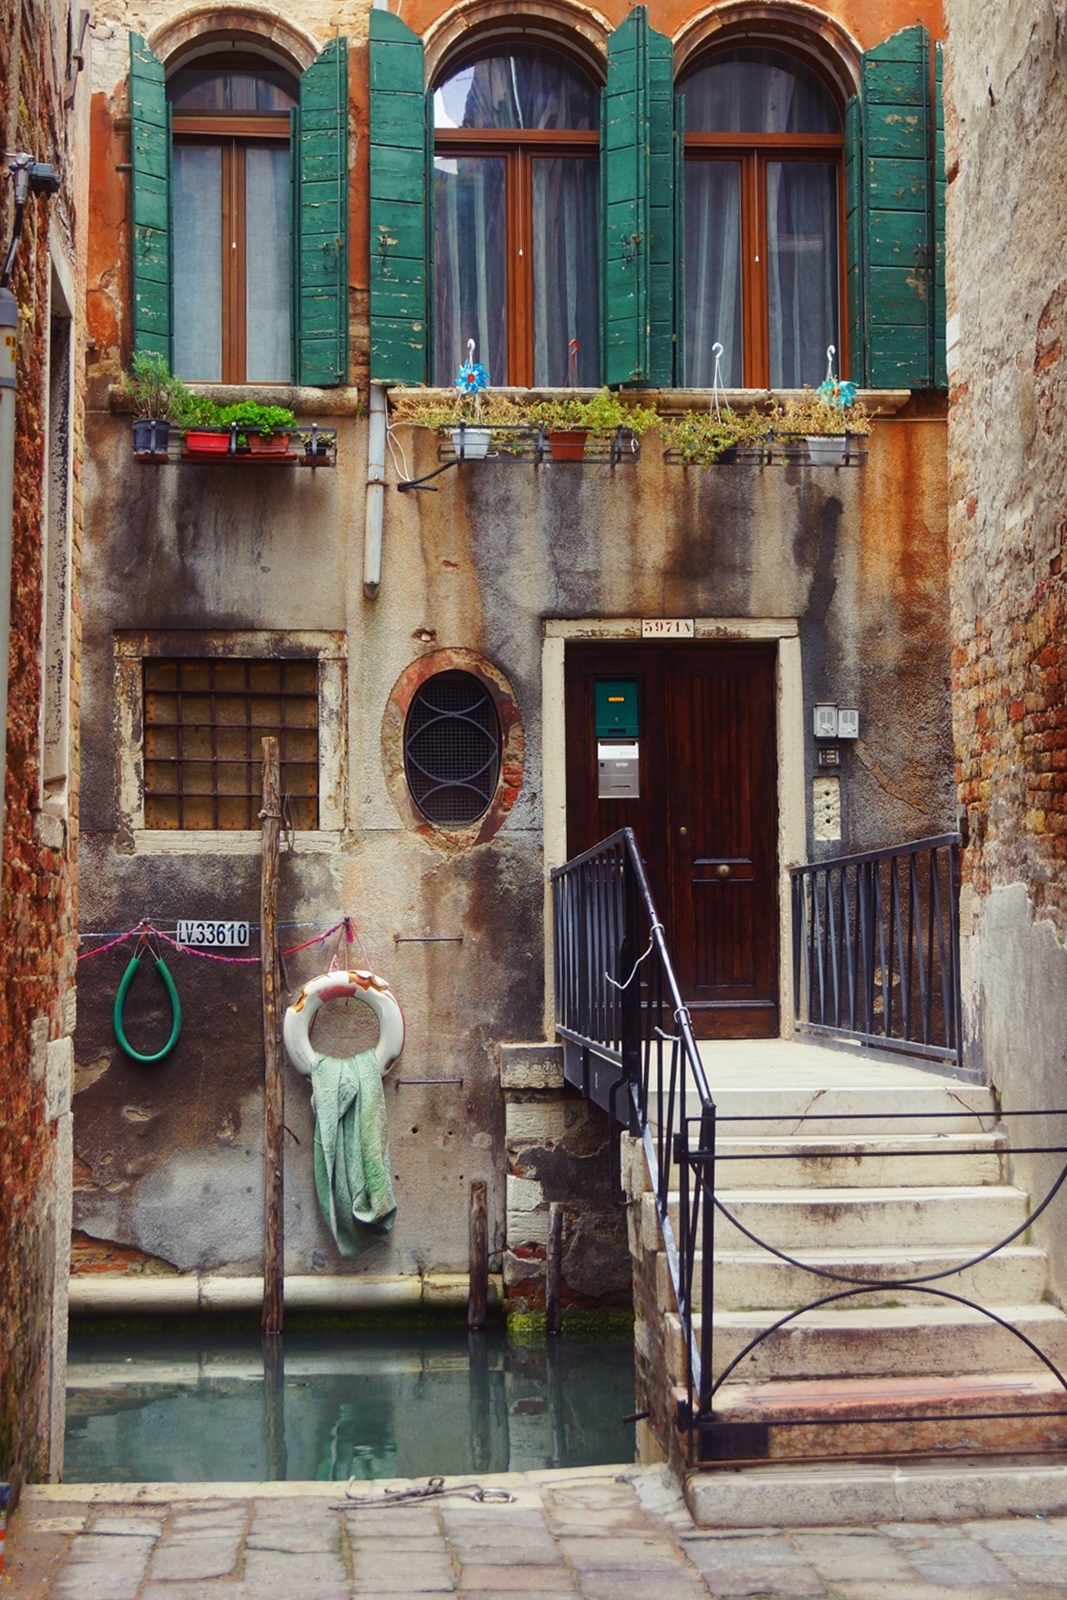 Venezia, Italy, 2014